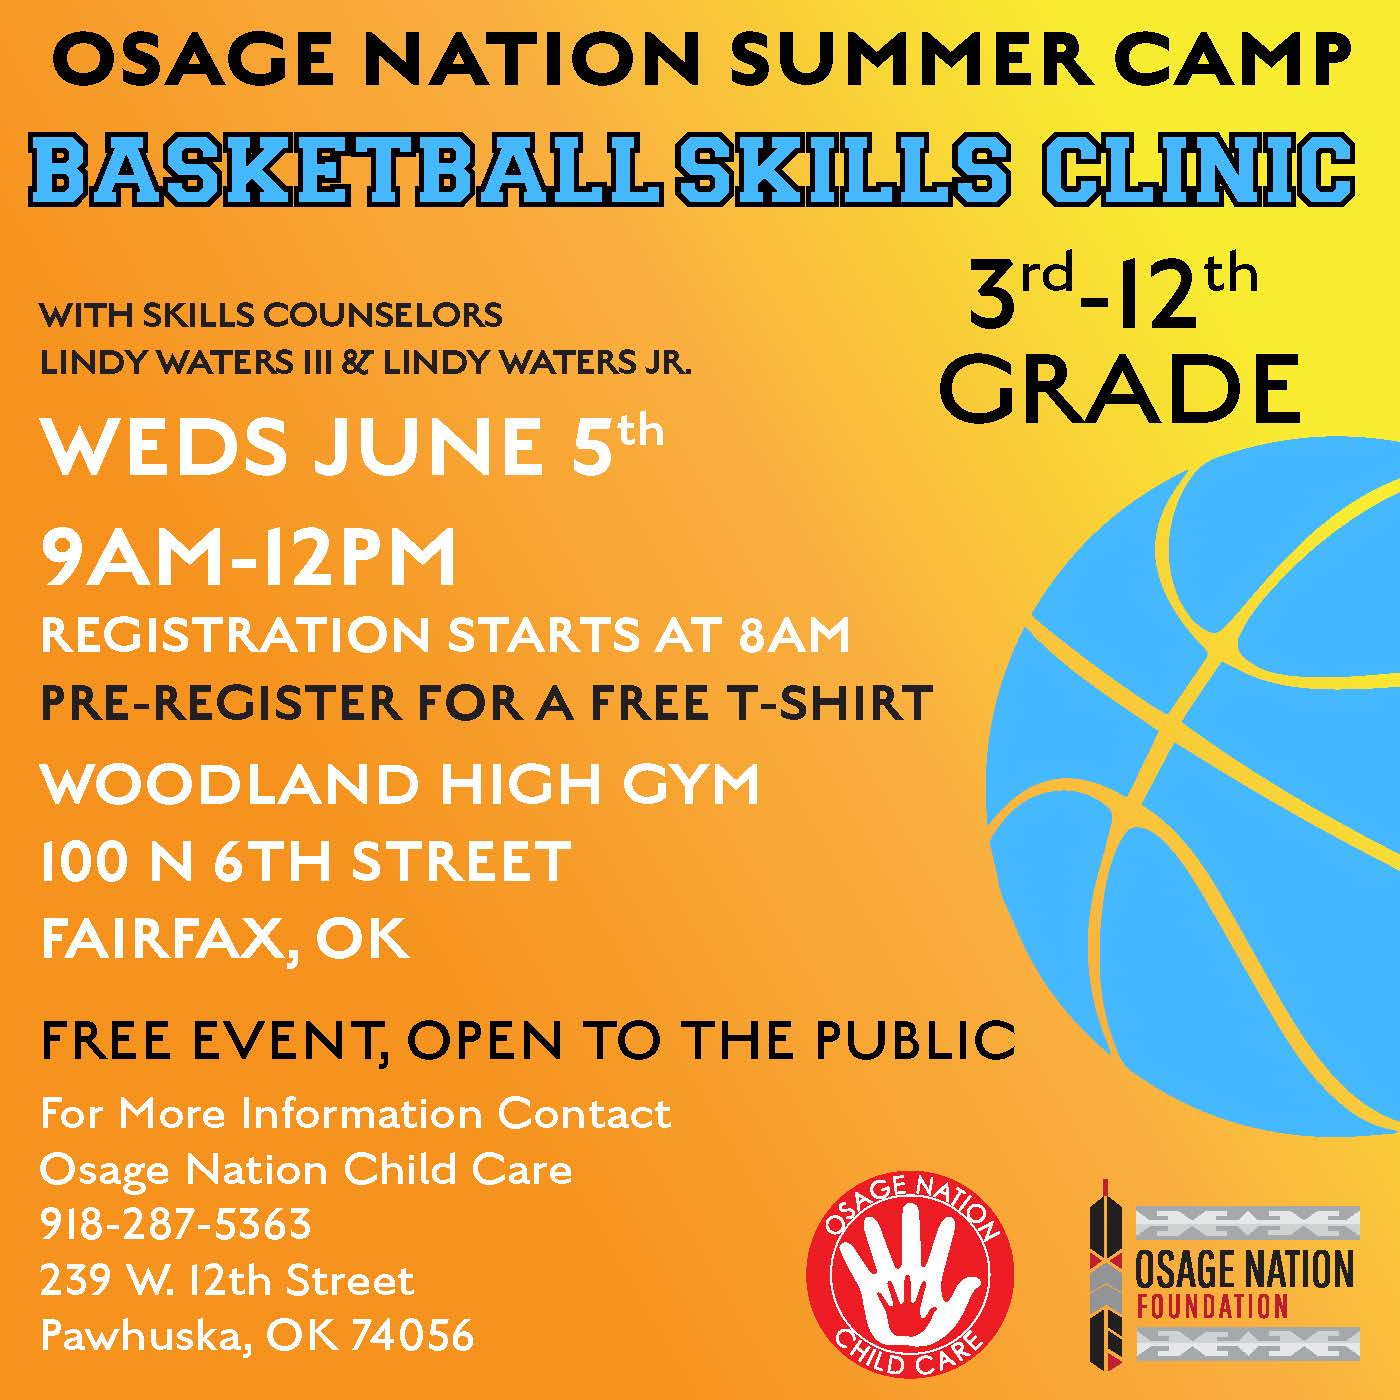 Basketball Camp flyer